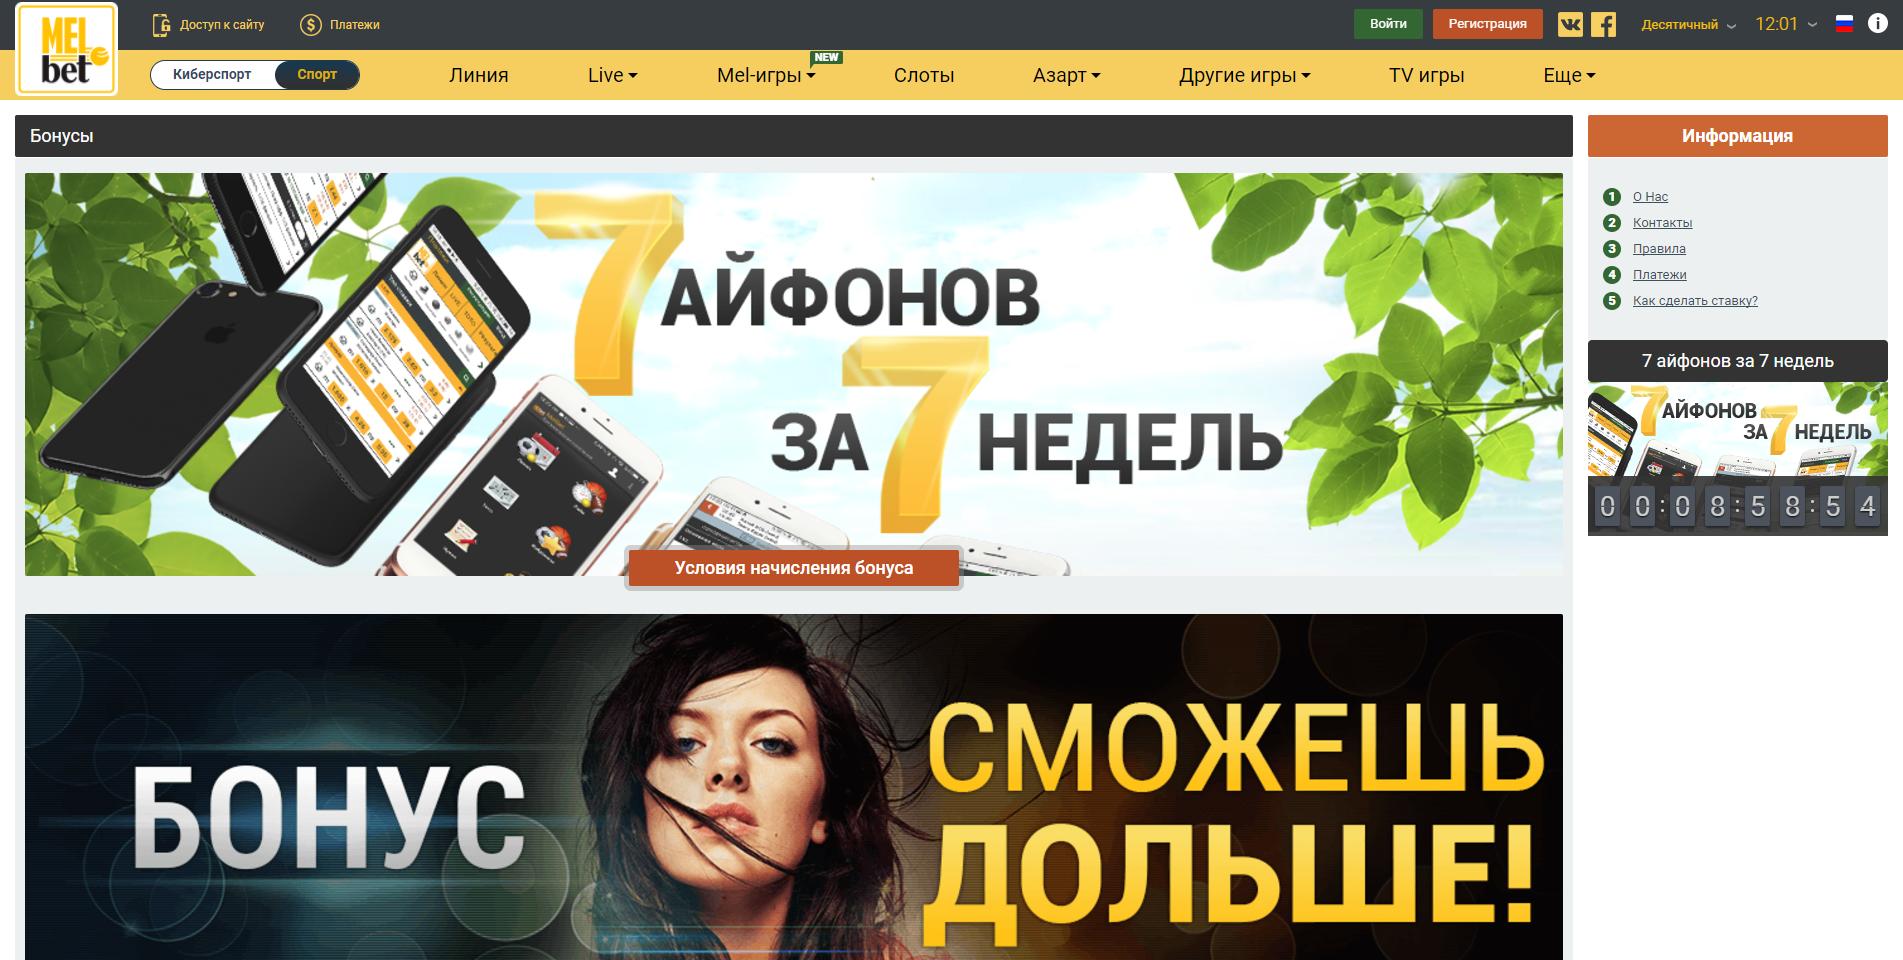 букмекерская контора Мелбет акции и бонусы